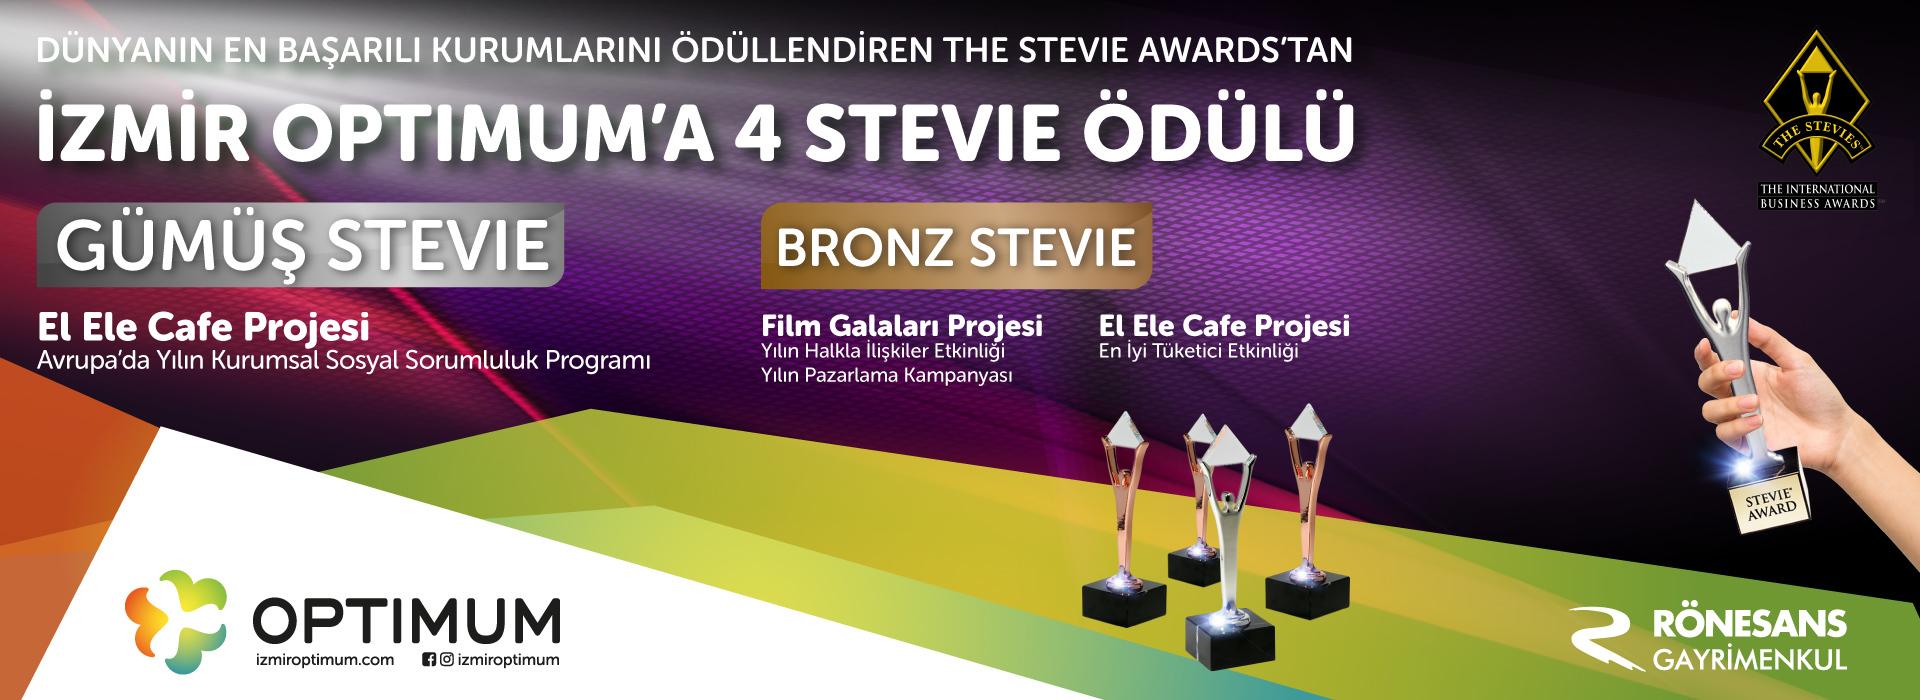 İzmir Optimum'a 4 Stevie Ödülü